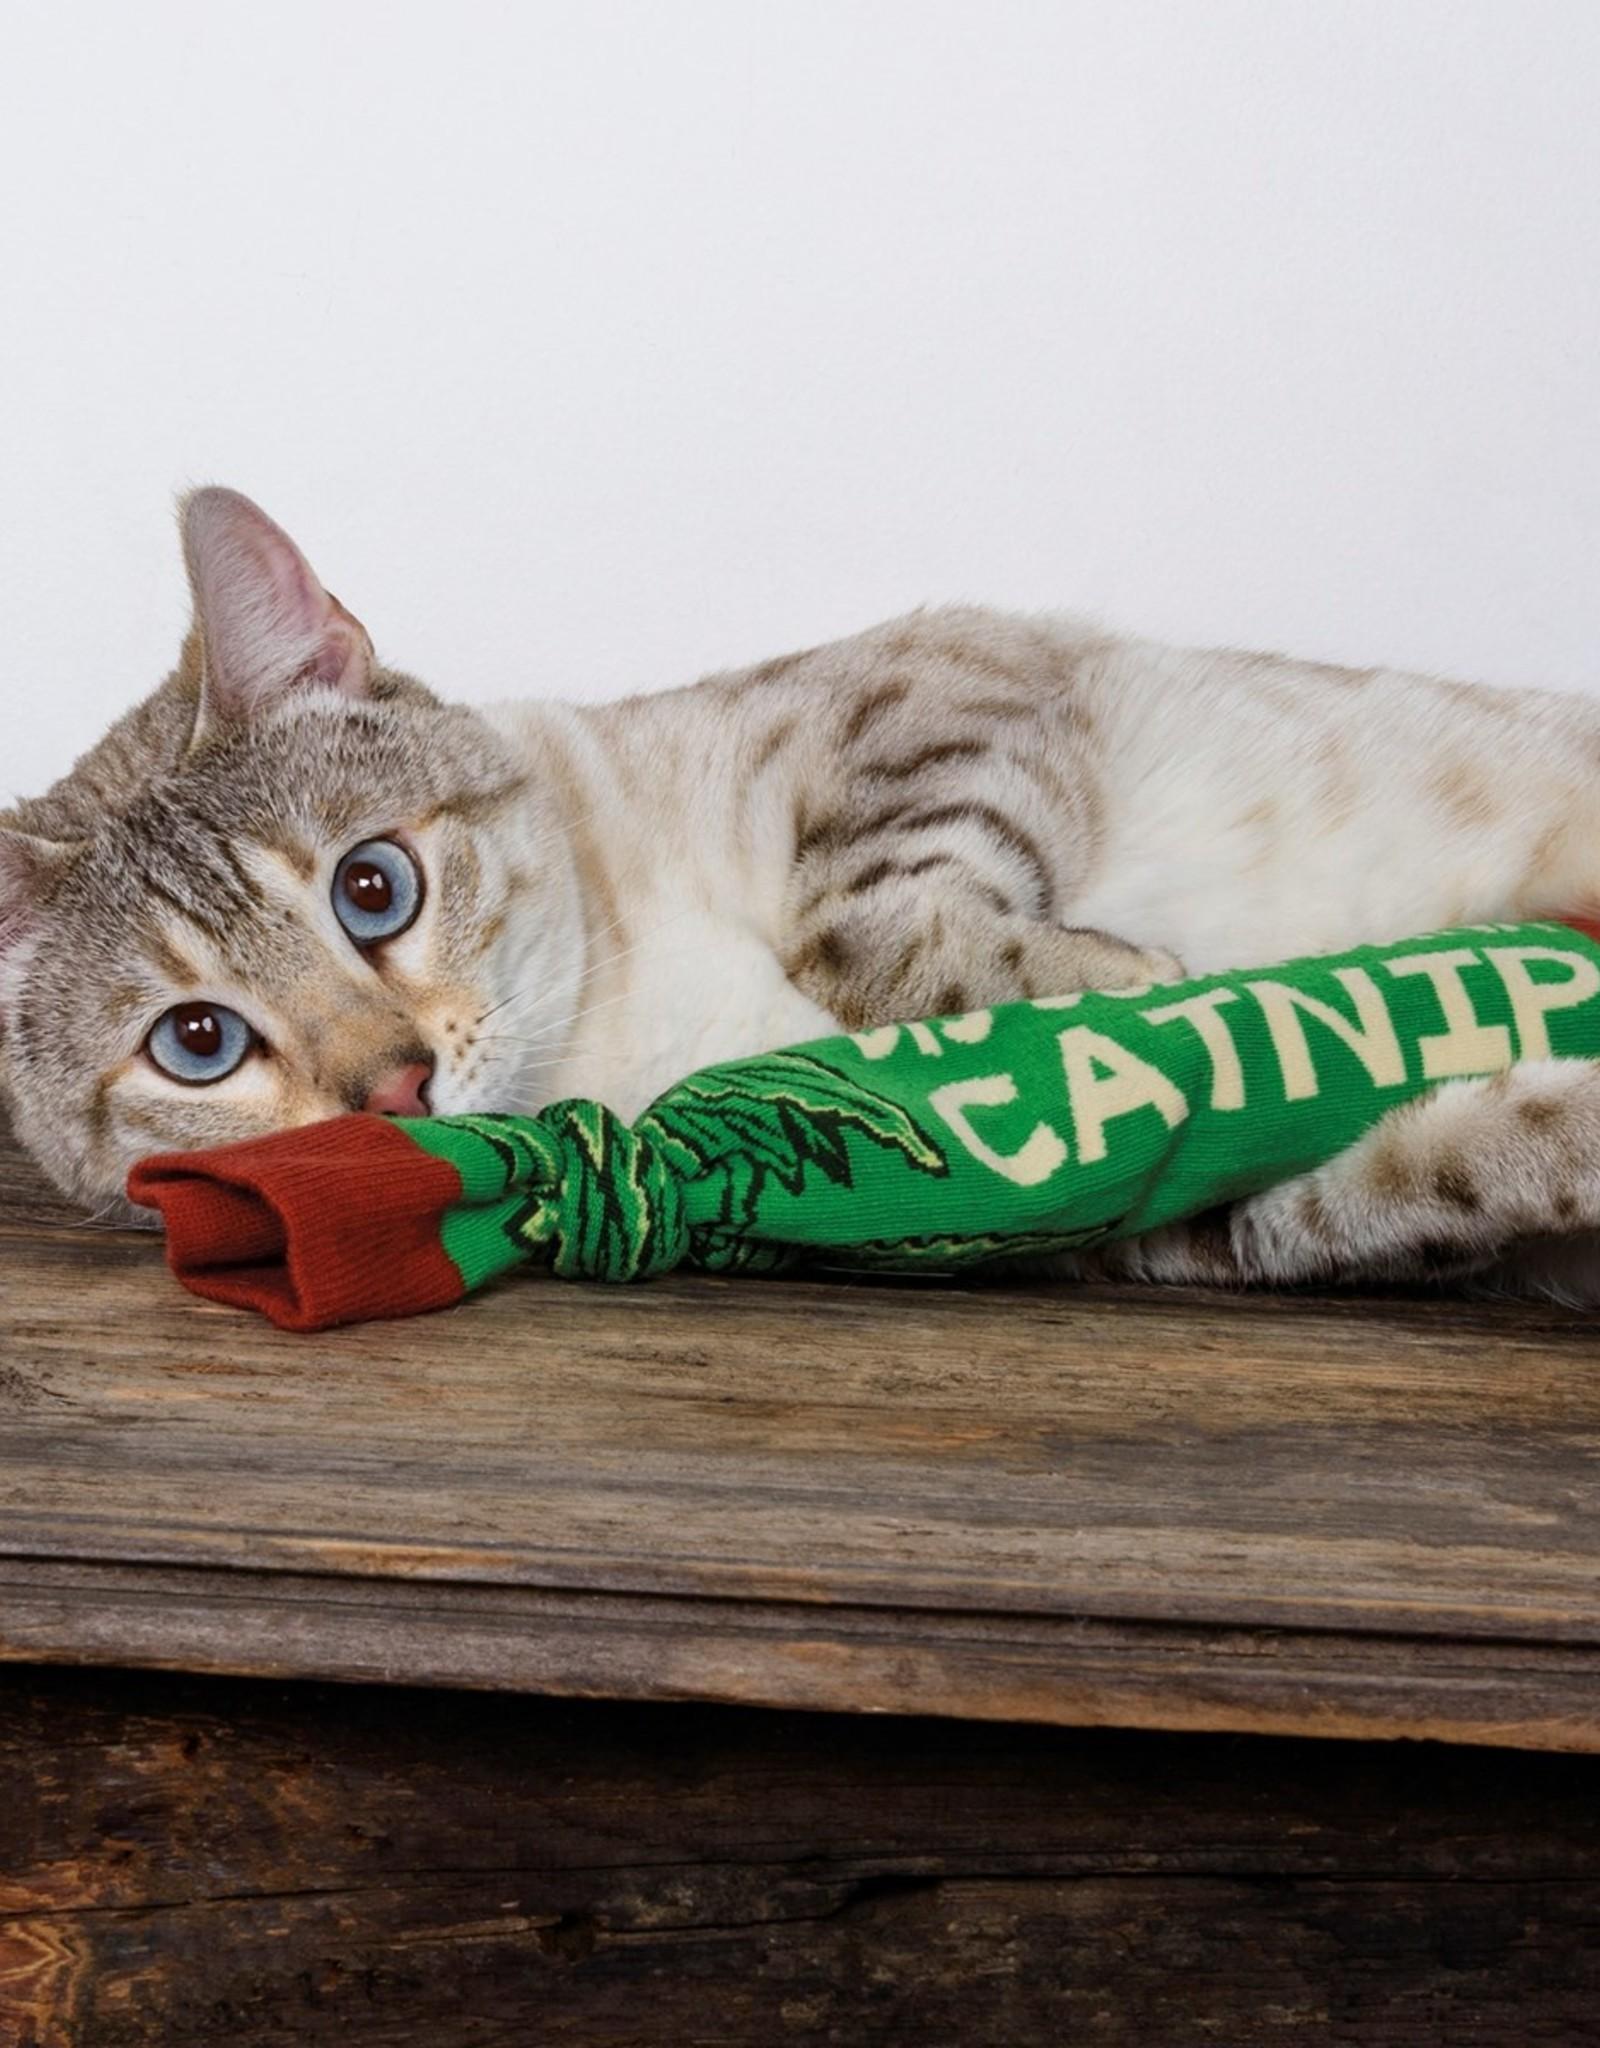 Primitives By Kathy Cat Toy - Dank Catnip